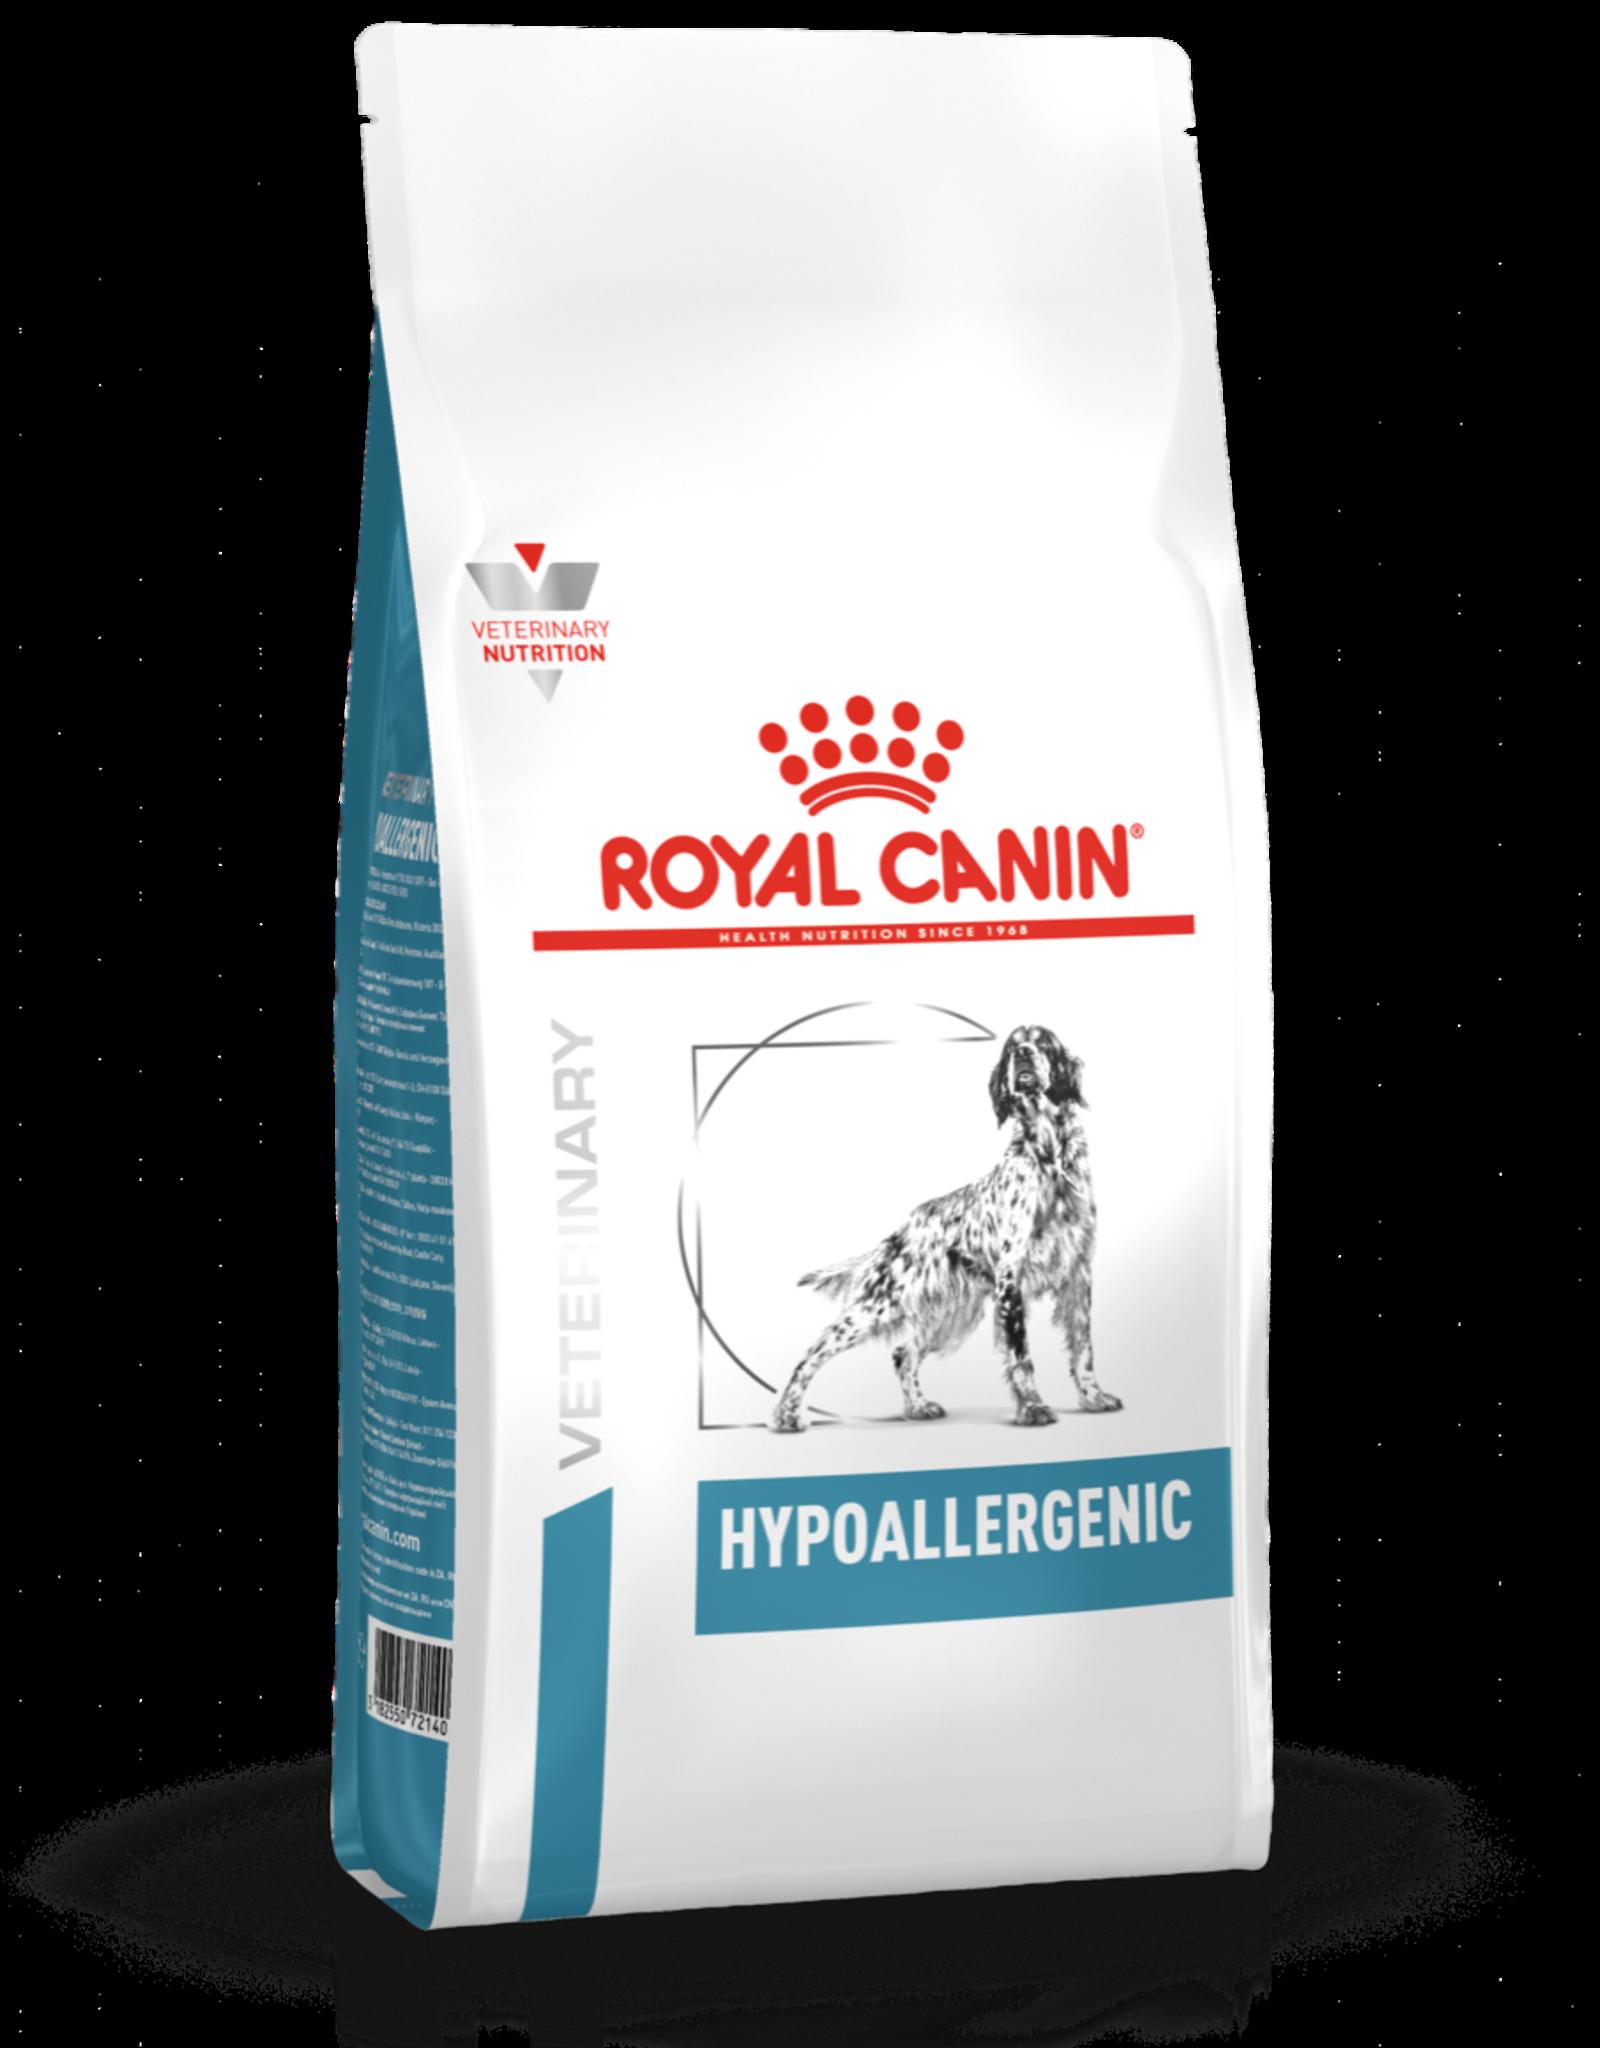 Royal Canin Royal Canin Hypoallergenic Hund 14kg